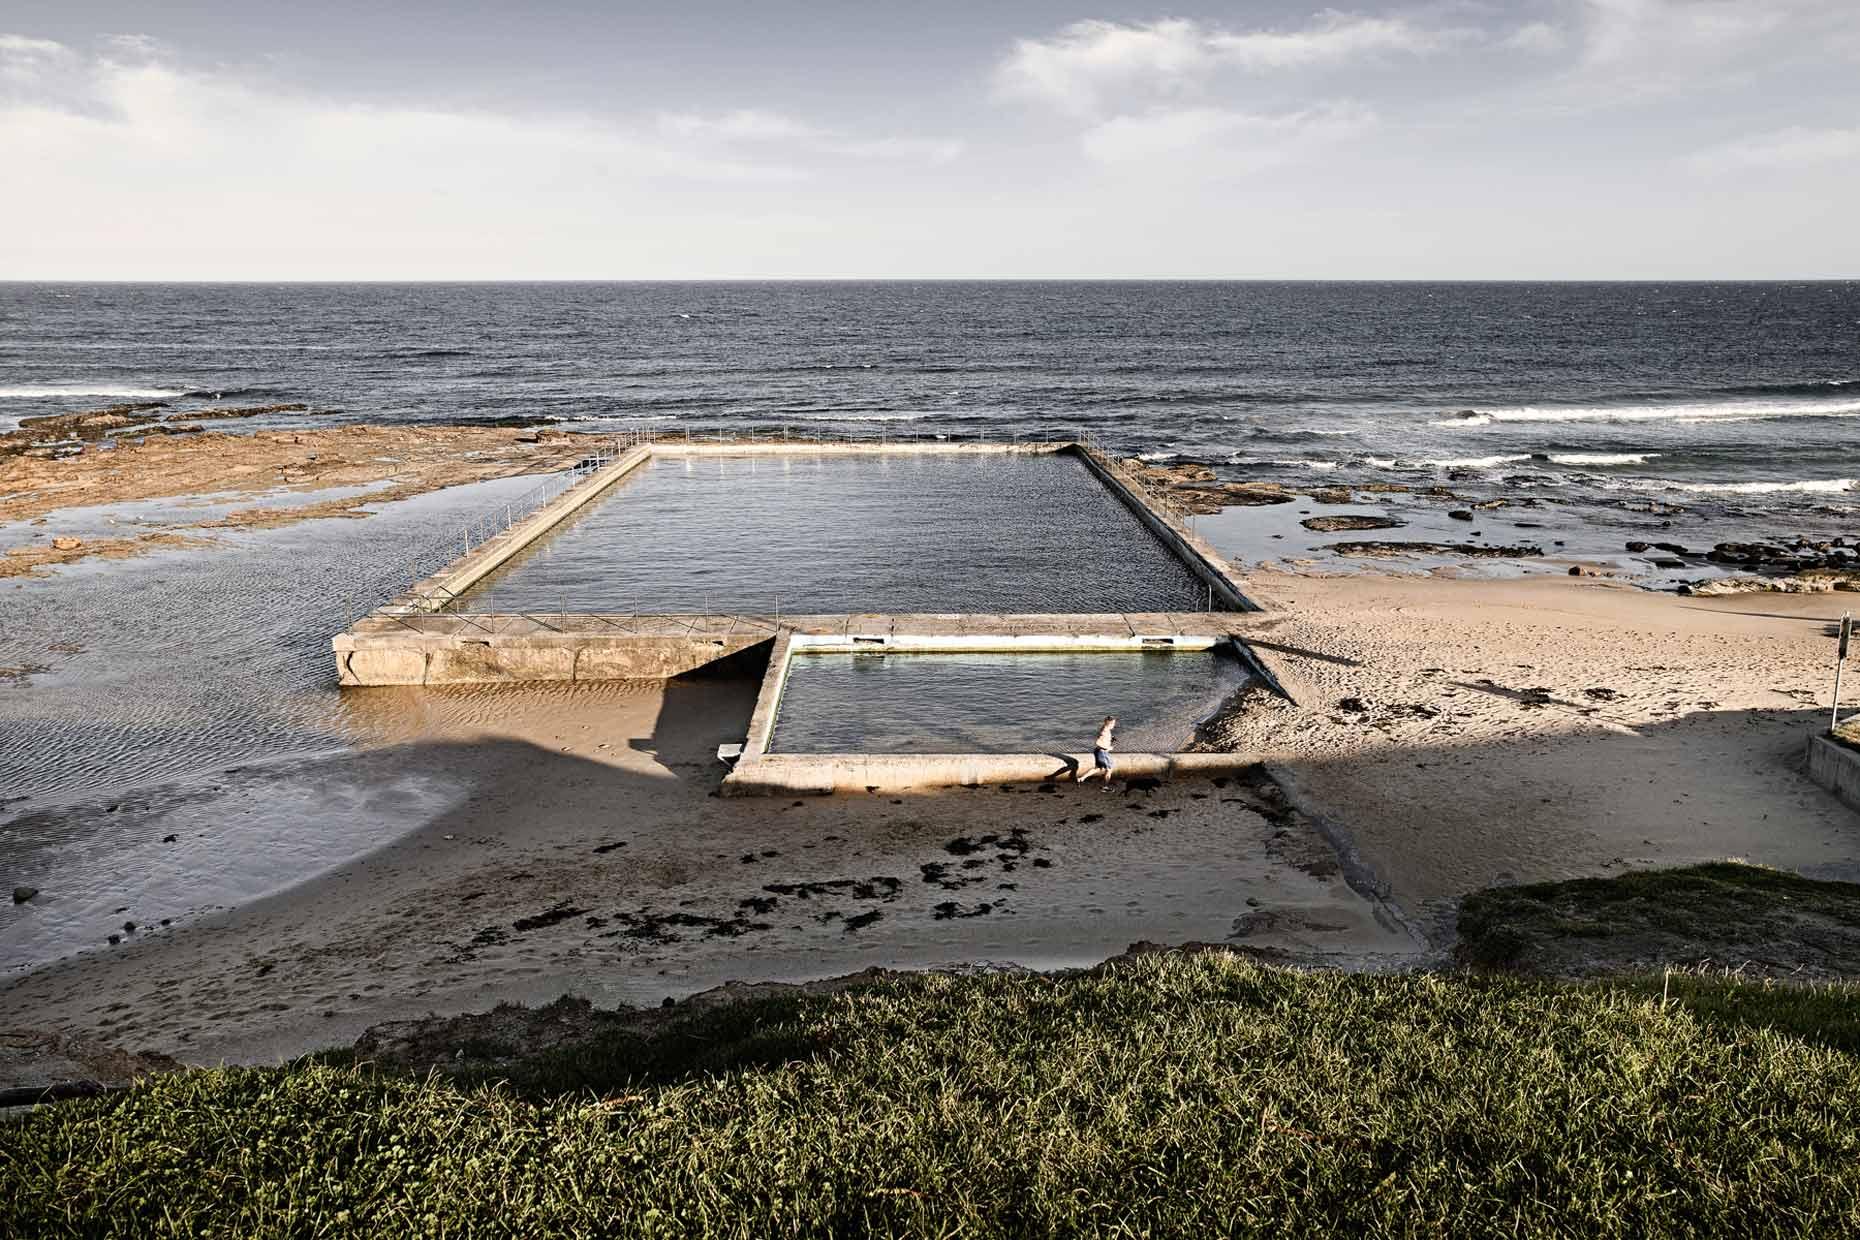 tidal-pools-australia-pim-vuik-fotografie-film-rotterdam-01.jpg